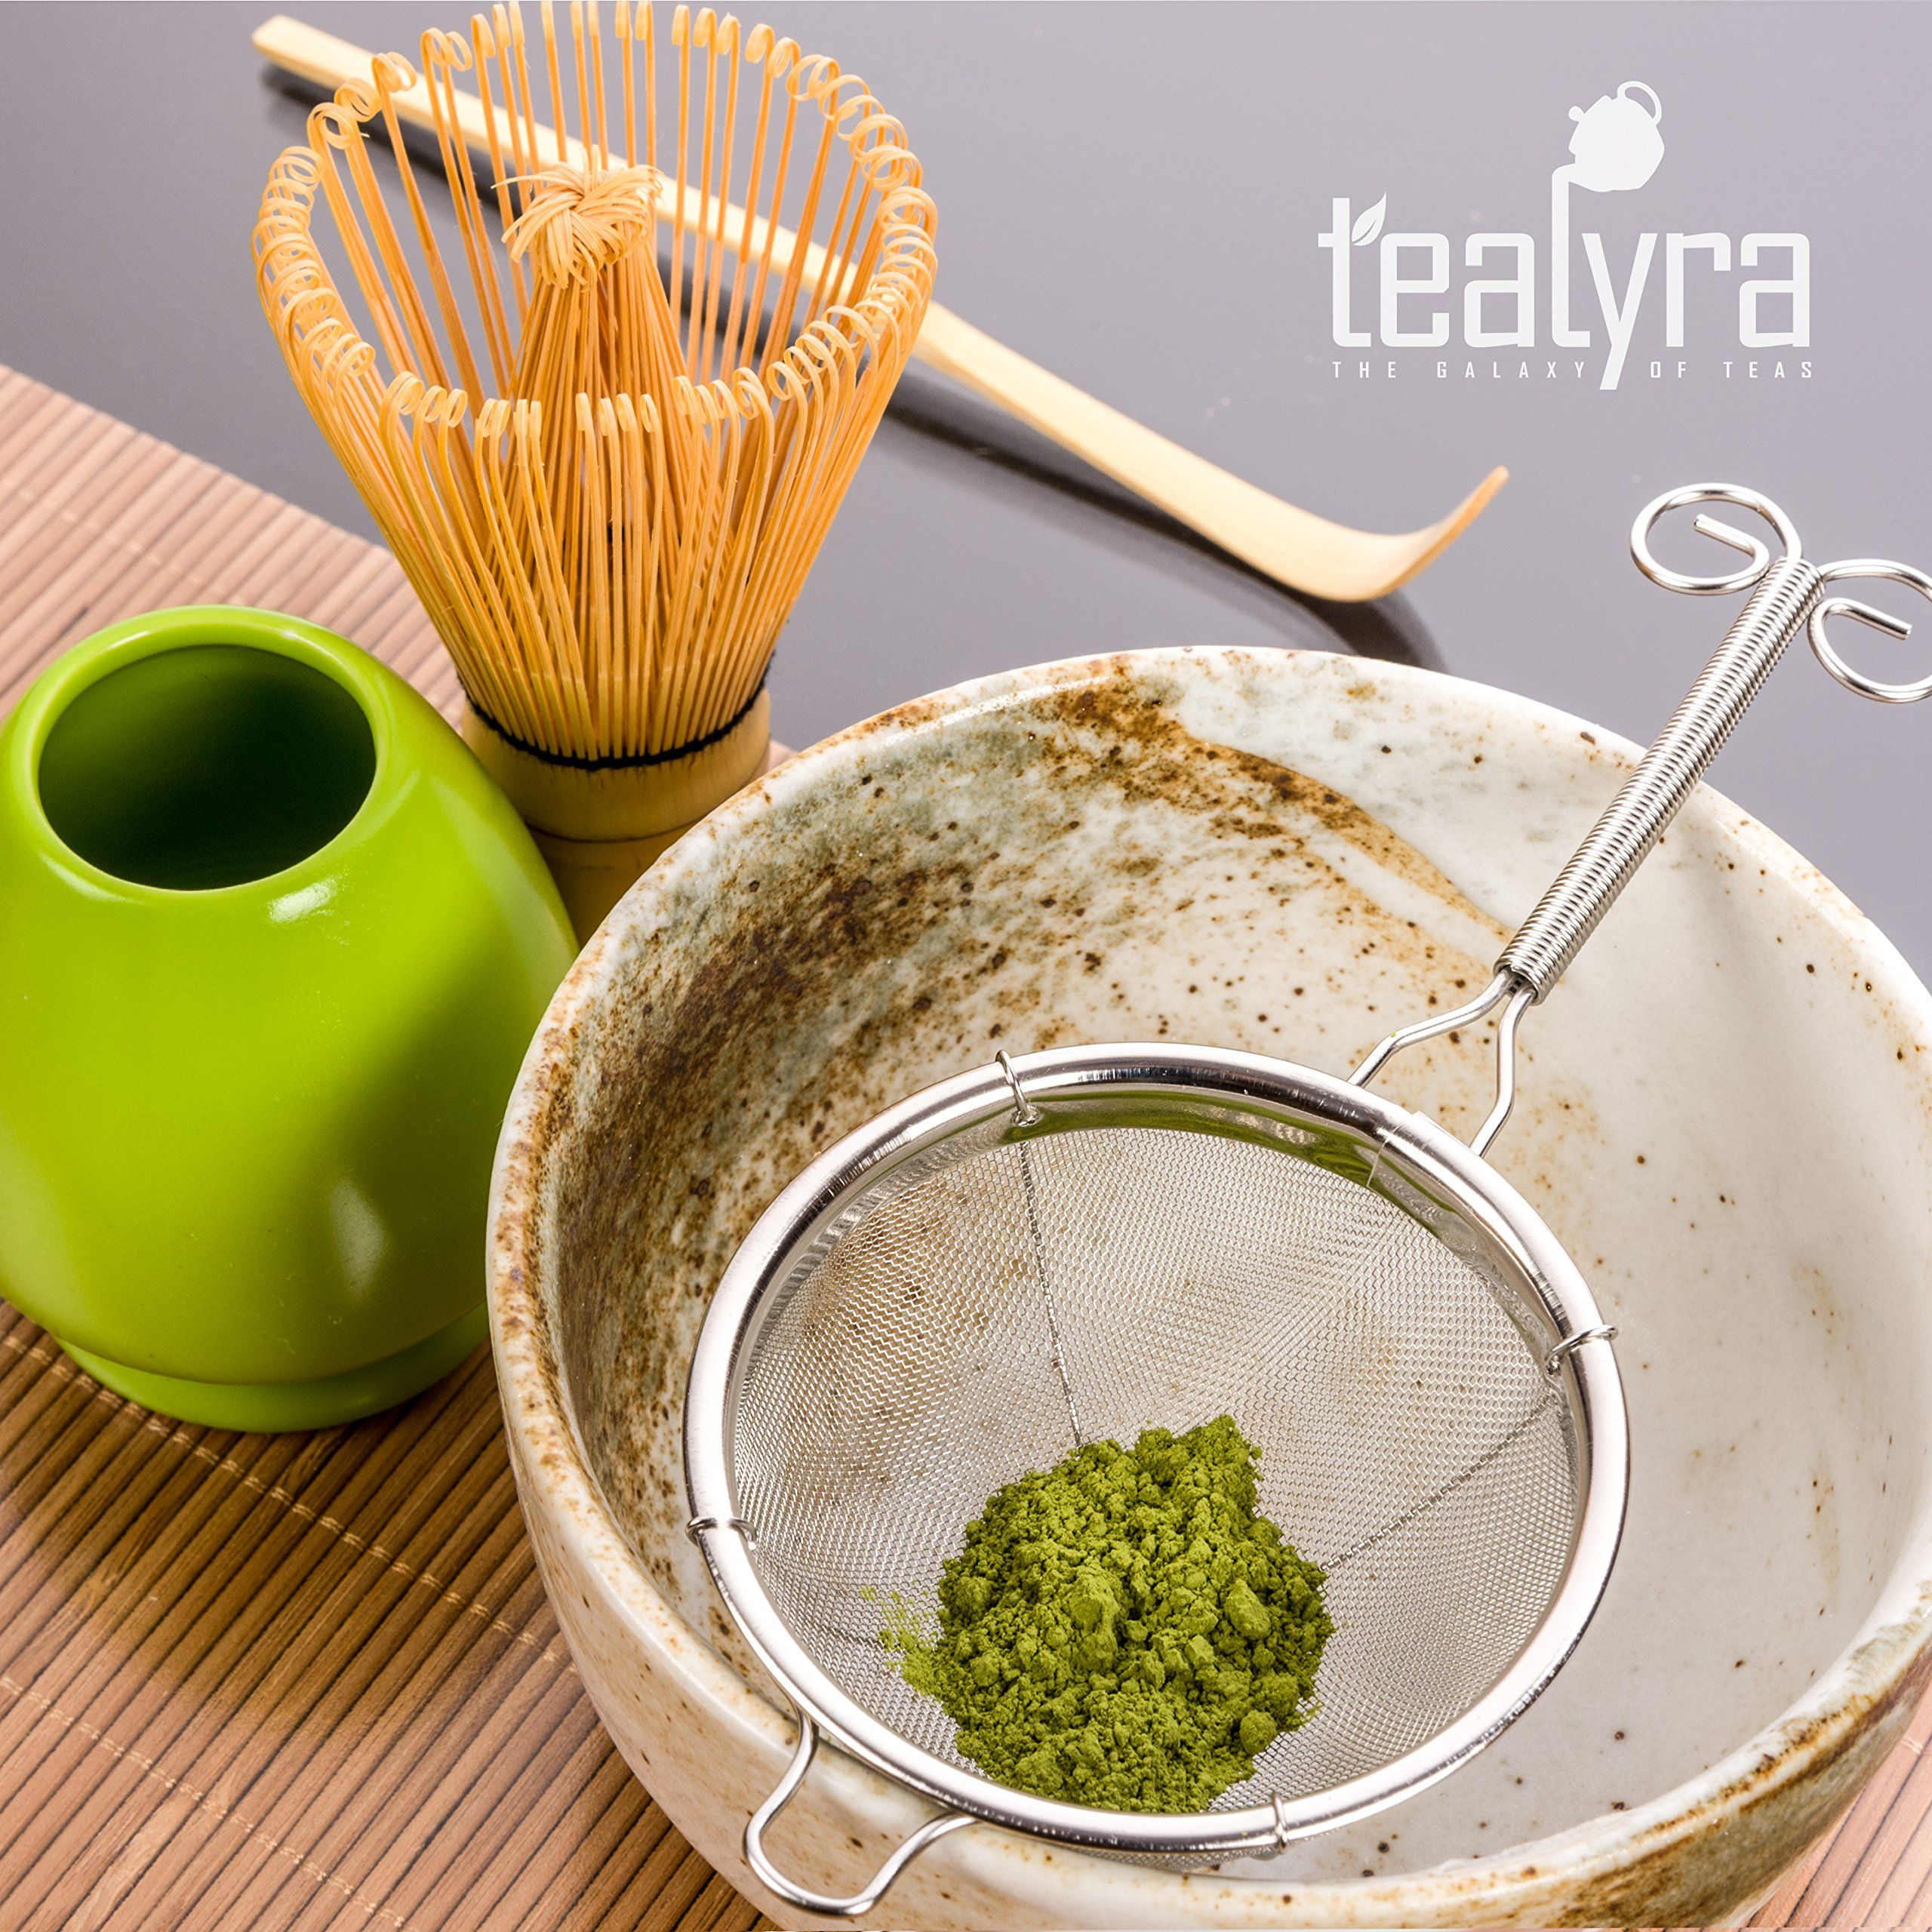 Tealyra Matcha Tea Ceremony Start Up Kit Complete Matcha Green Tea